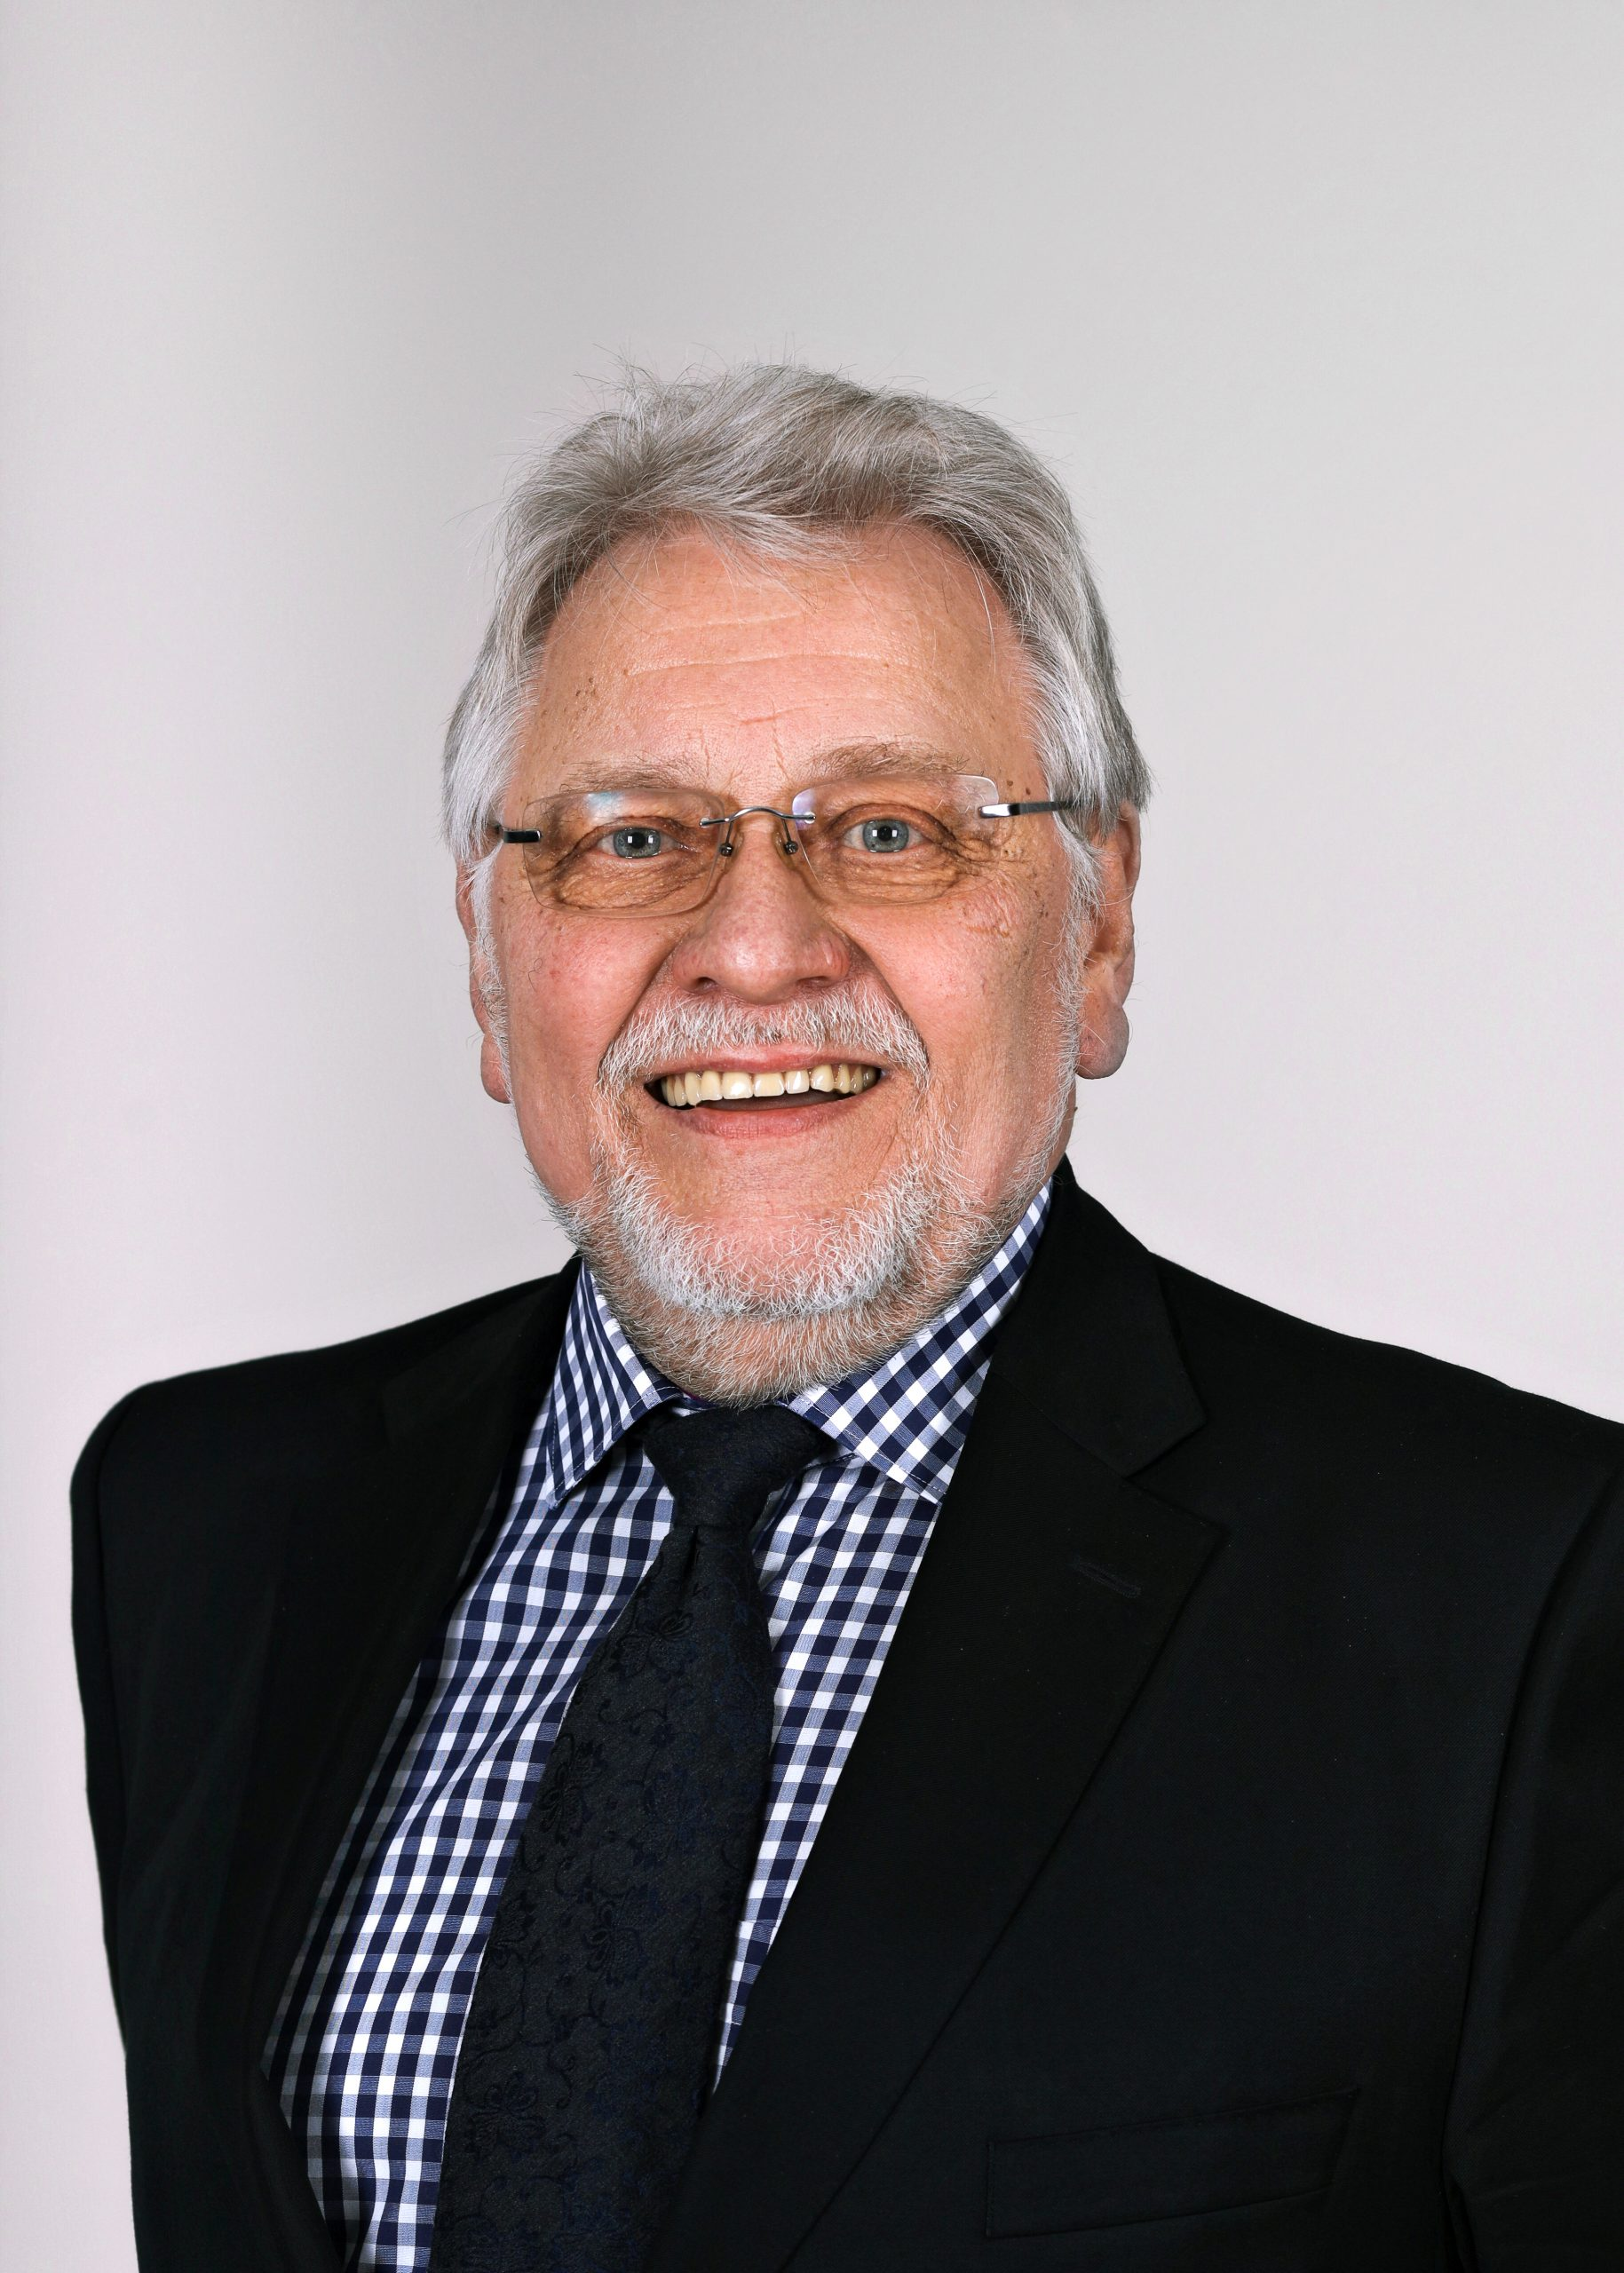 Winfried Schlemper